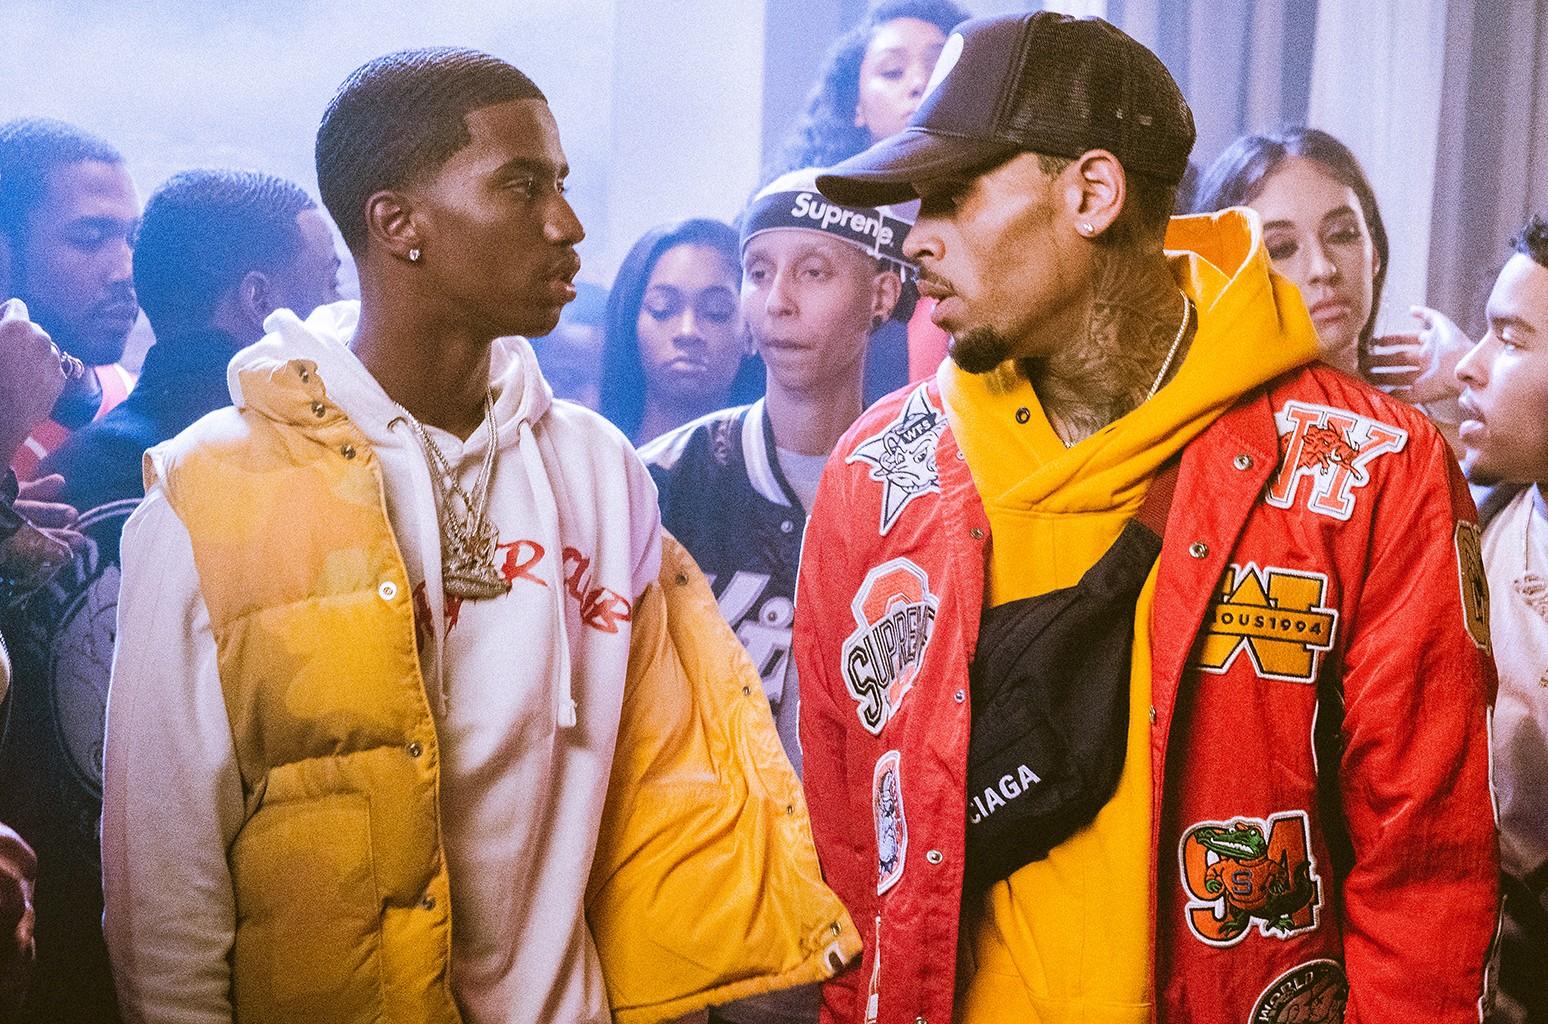 King Combs and Chris Brown